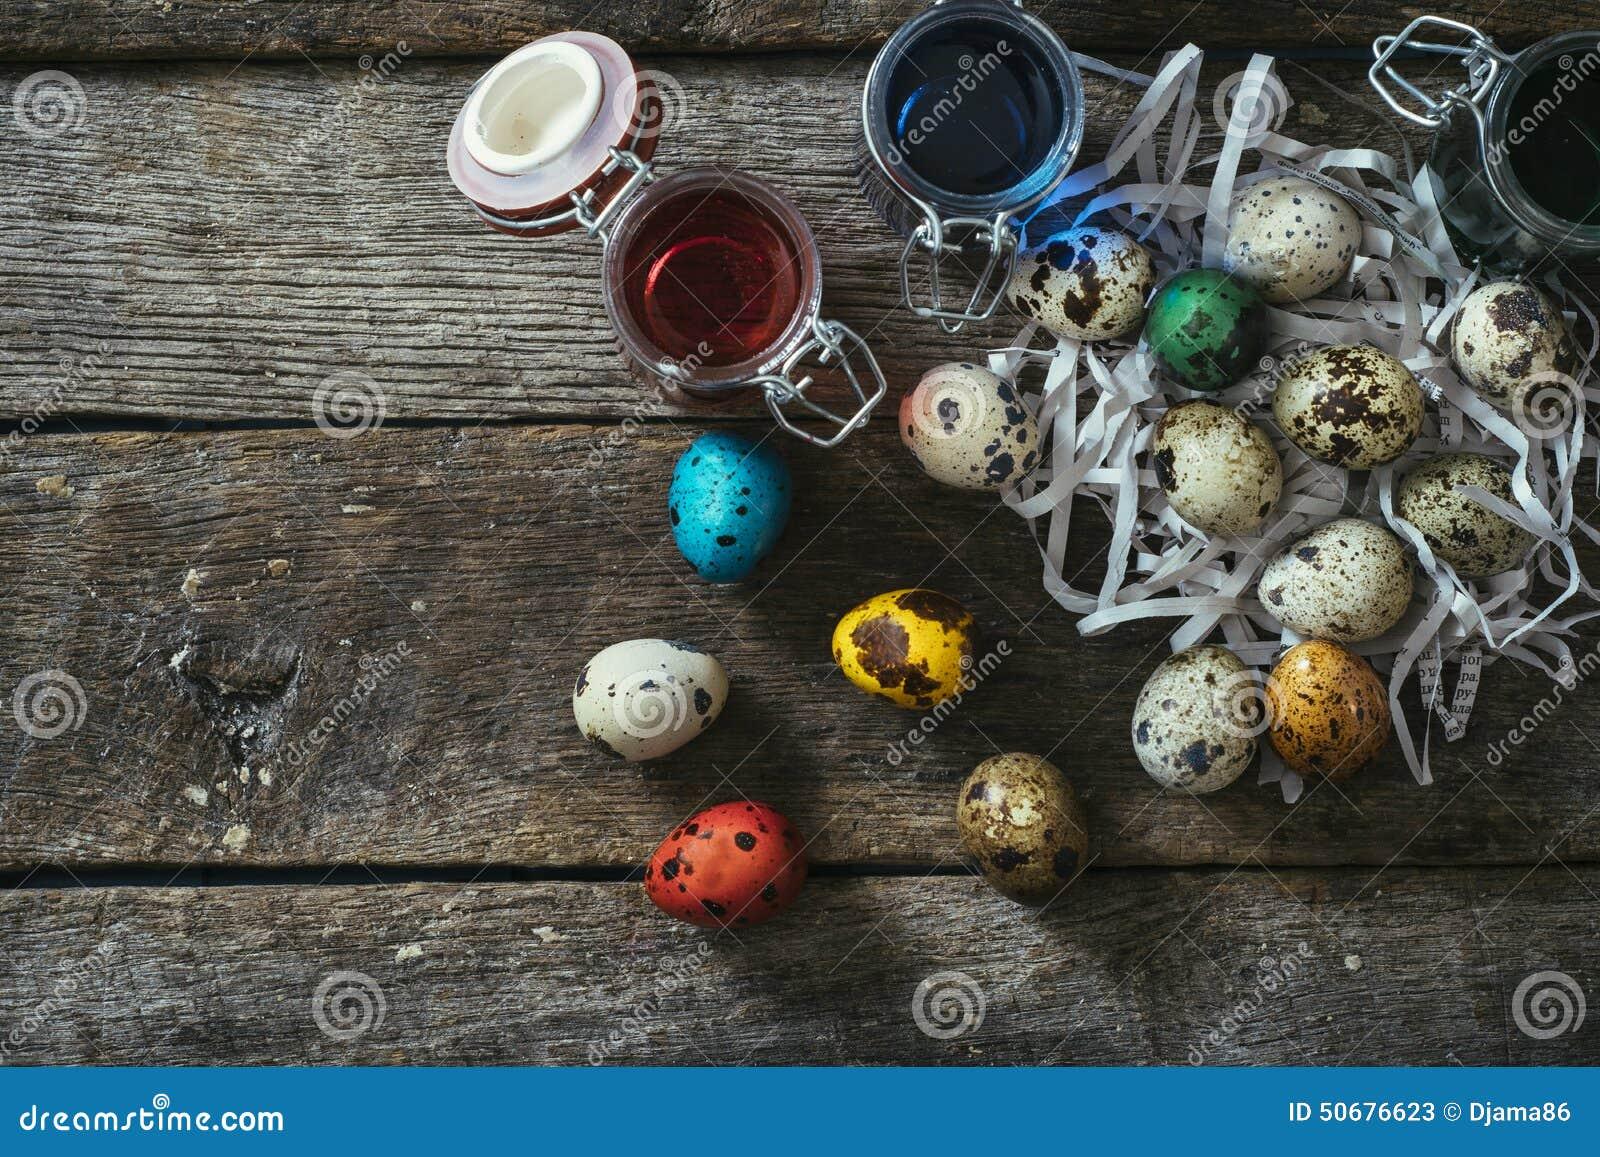 Download 所有背景蓬蒿碗柔荑花复活节彩蛋木一些表的蕃茄 库存图片. 图片 包括有 食物, 概念, beautifuler - 50676623